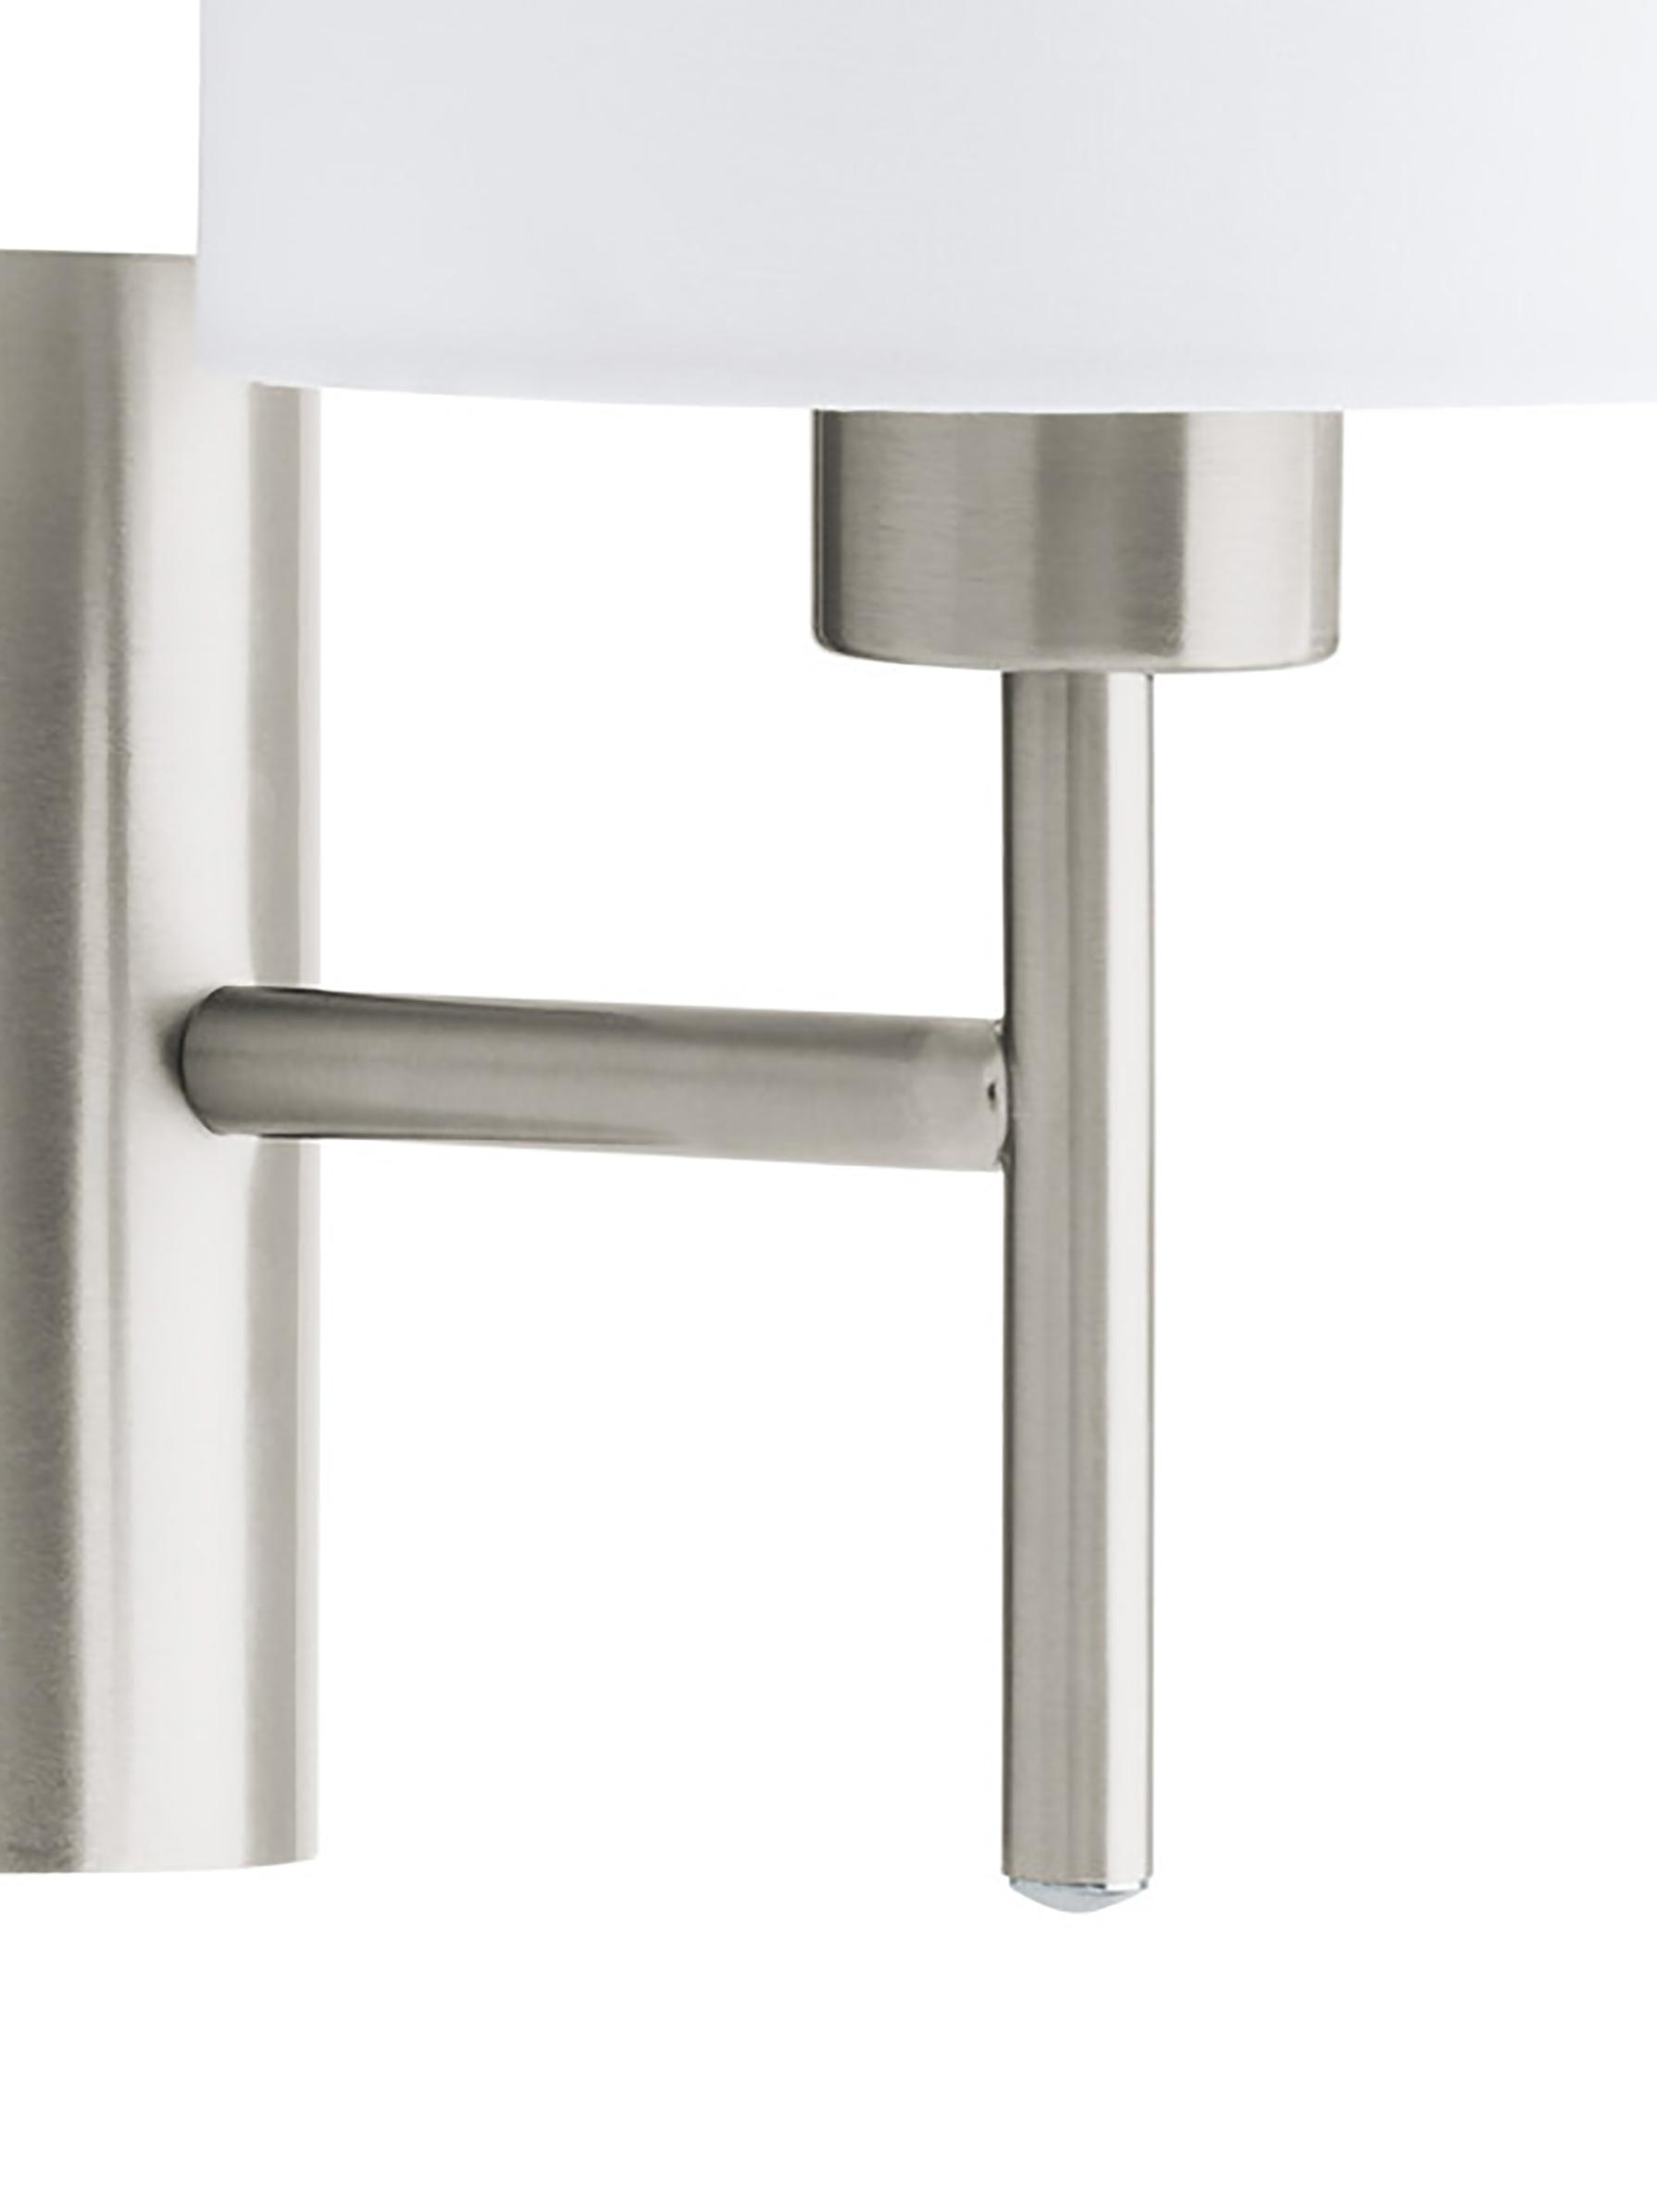 Applique Mick, Baldacchino: metallo nichelato, Paralume: tessile, Bianco, argentato, Ø 15 x Alt. 31 cm